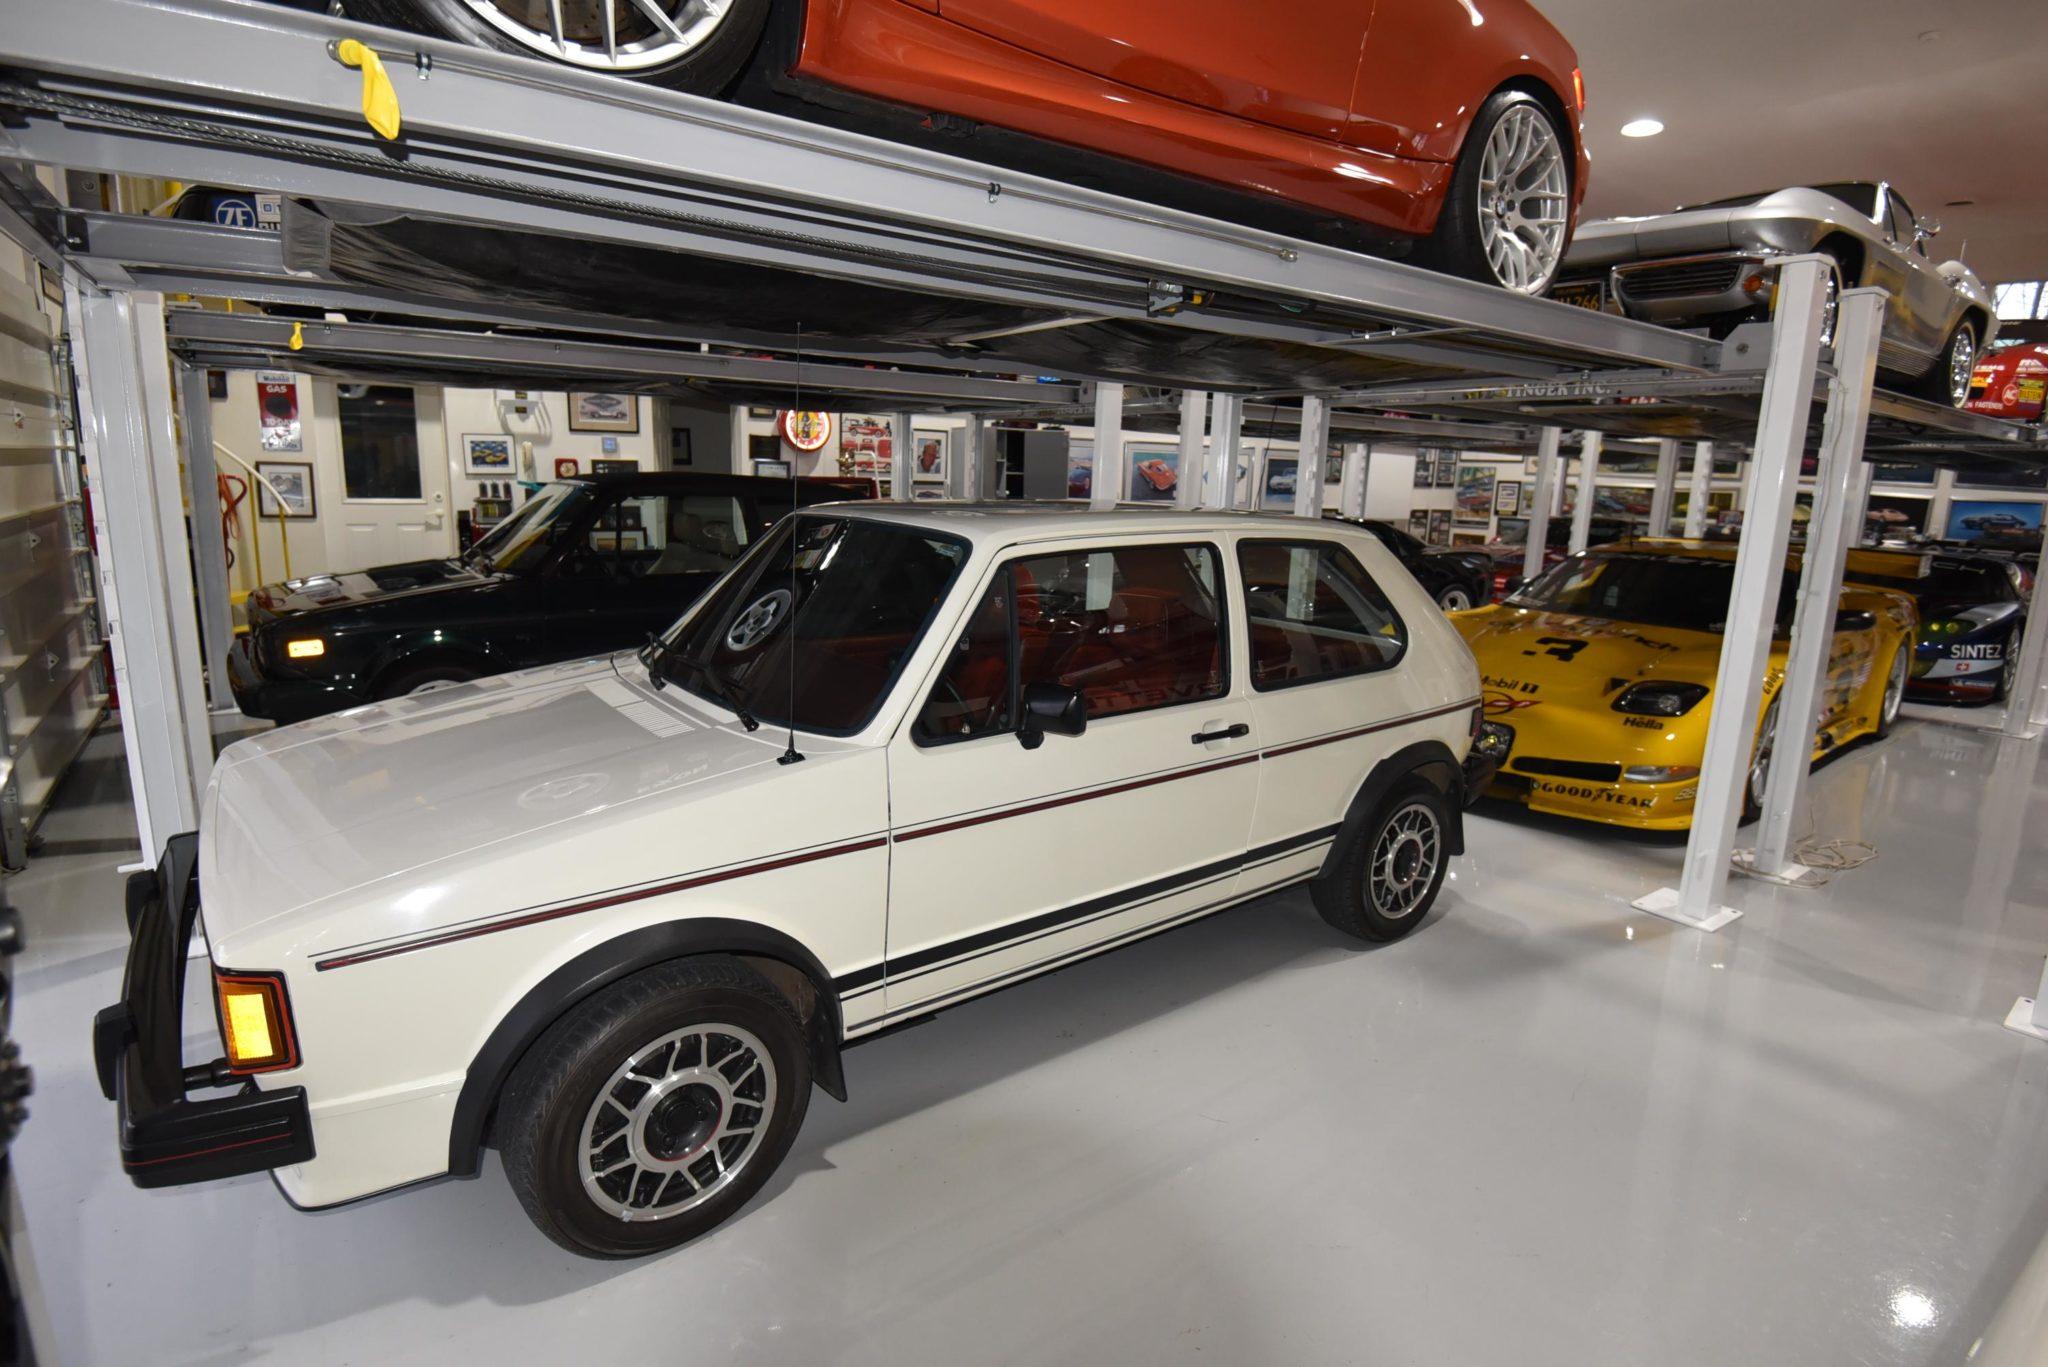 Audi Hands Out Magna Dealer Awards Fourtitudecom - Audi dealers in illinois